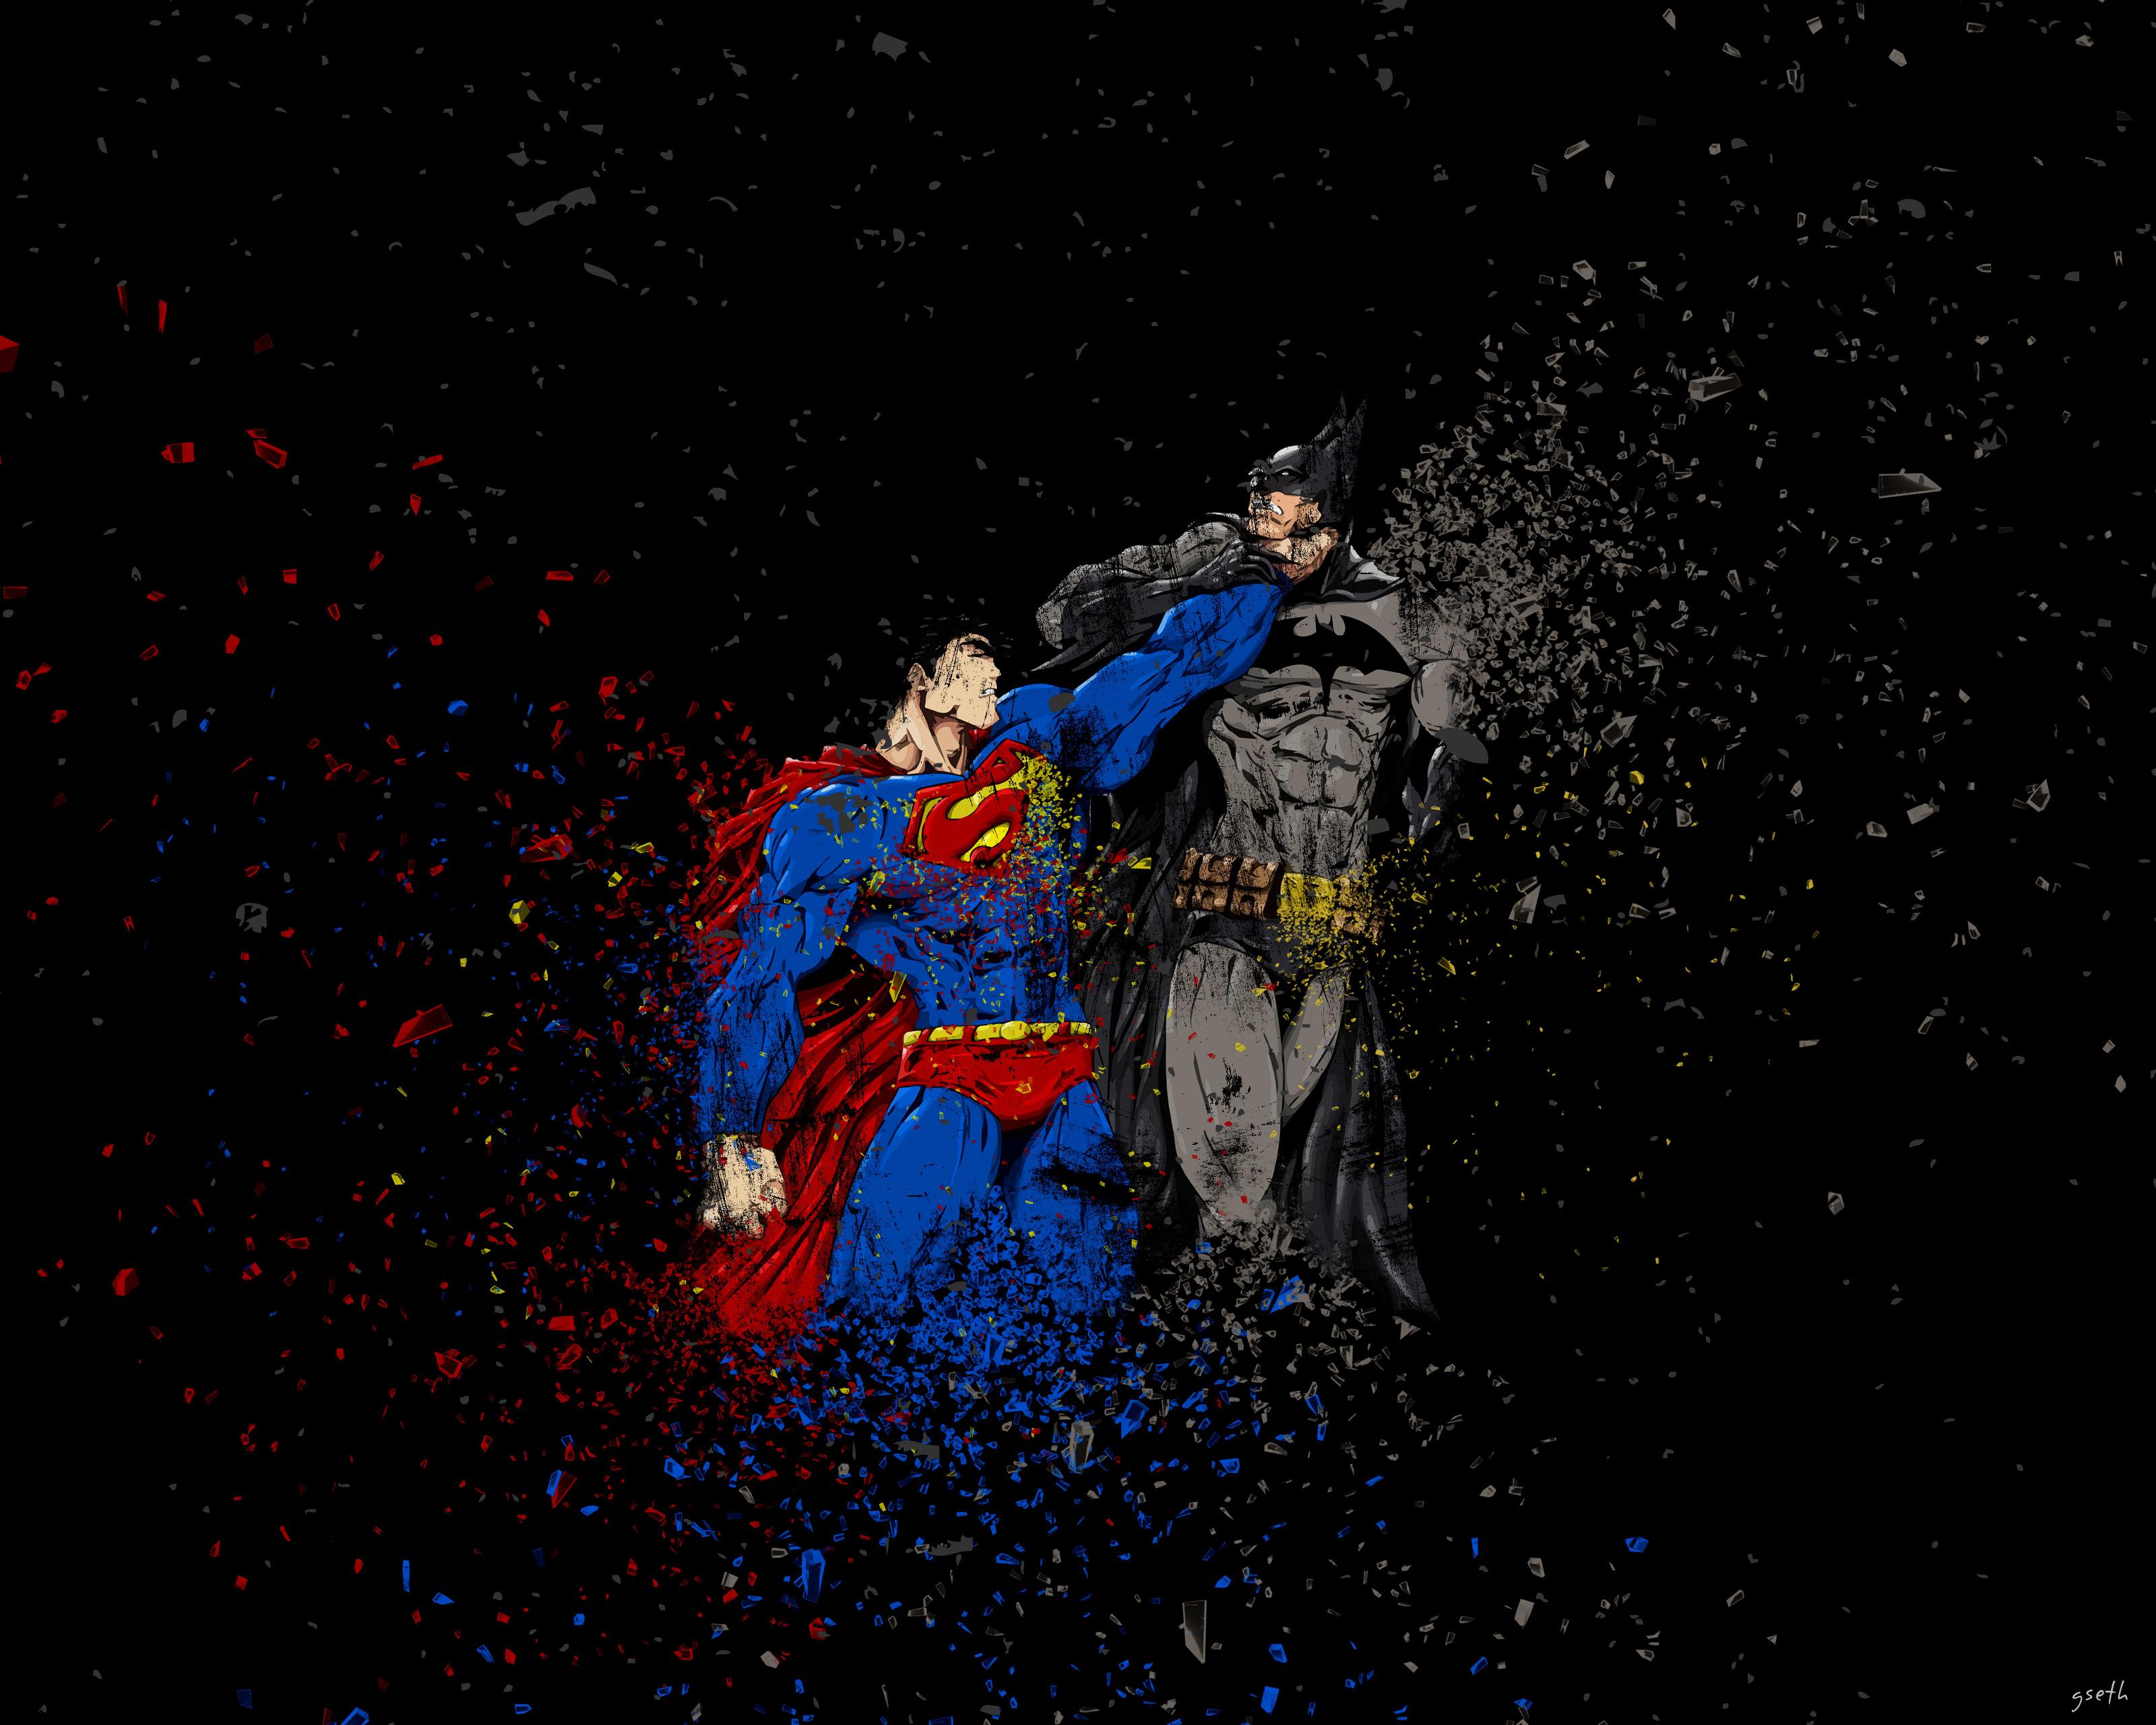 Batman Vs Superman Ruggon Style HD 4K Wallpaper